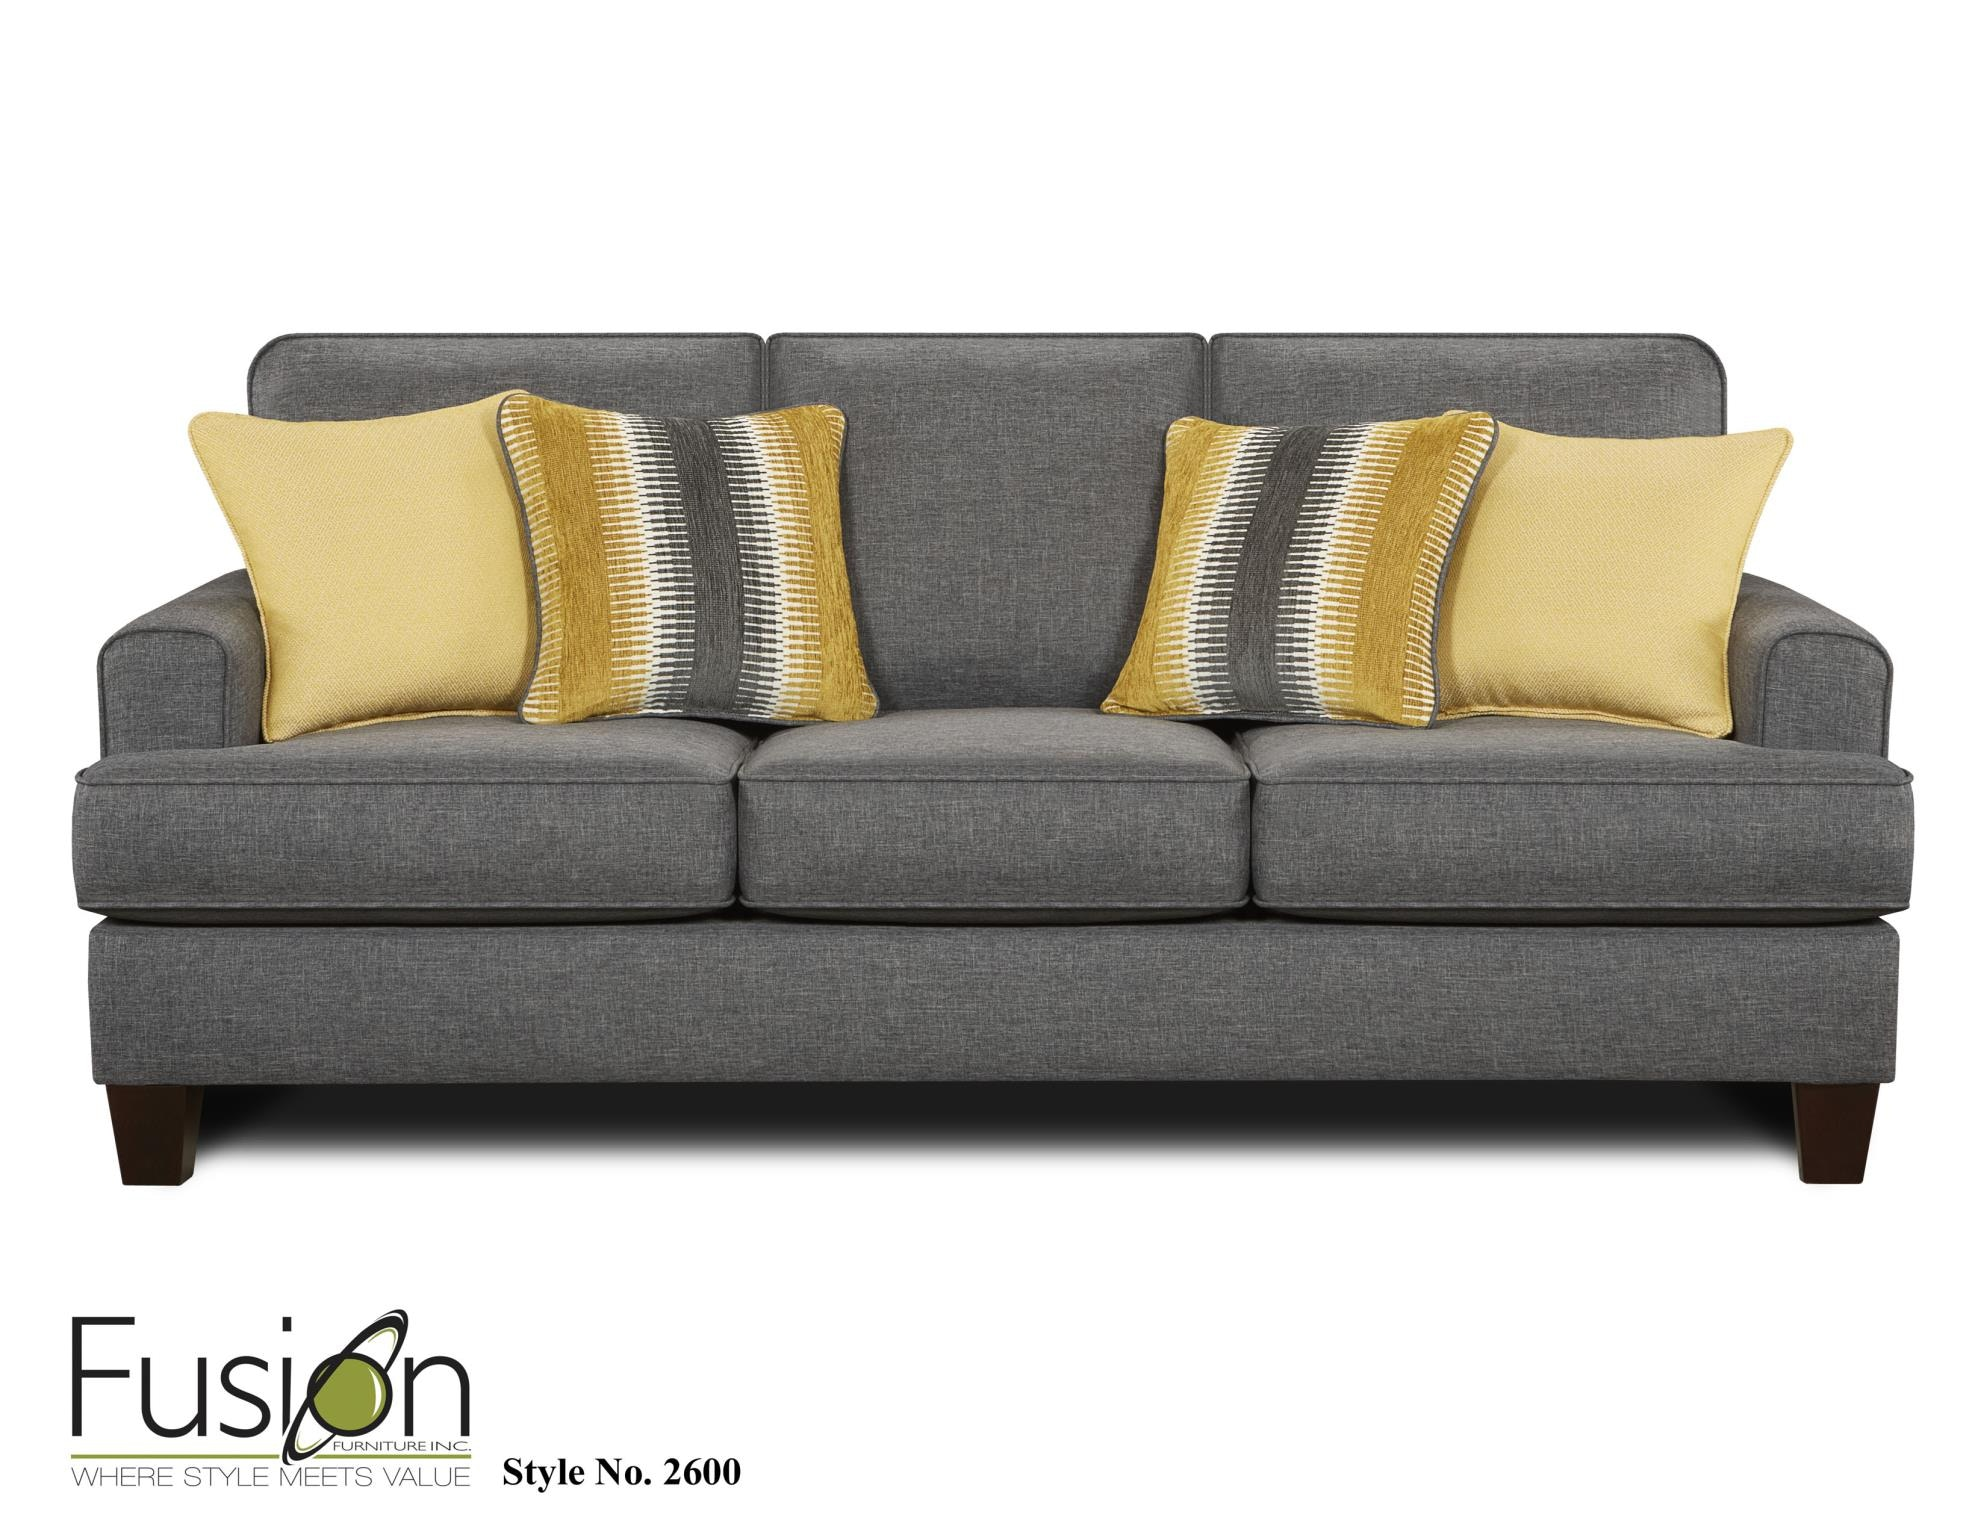 Charmant Fusion Sofa Sleeper 2604Maxwell Gray